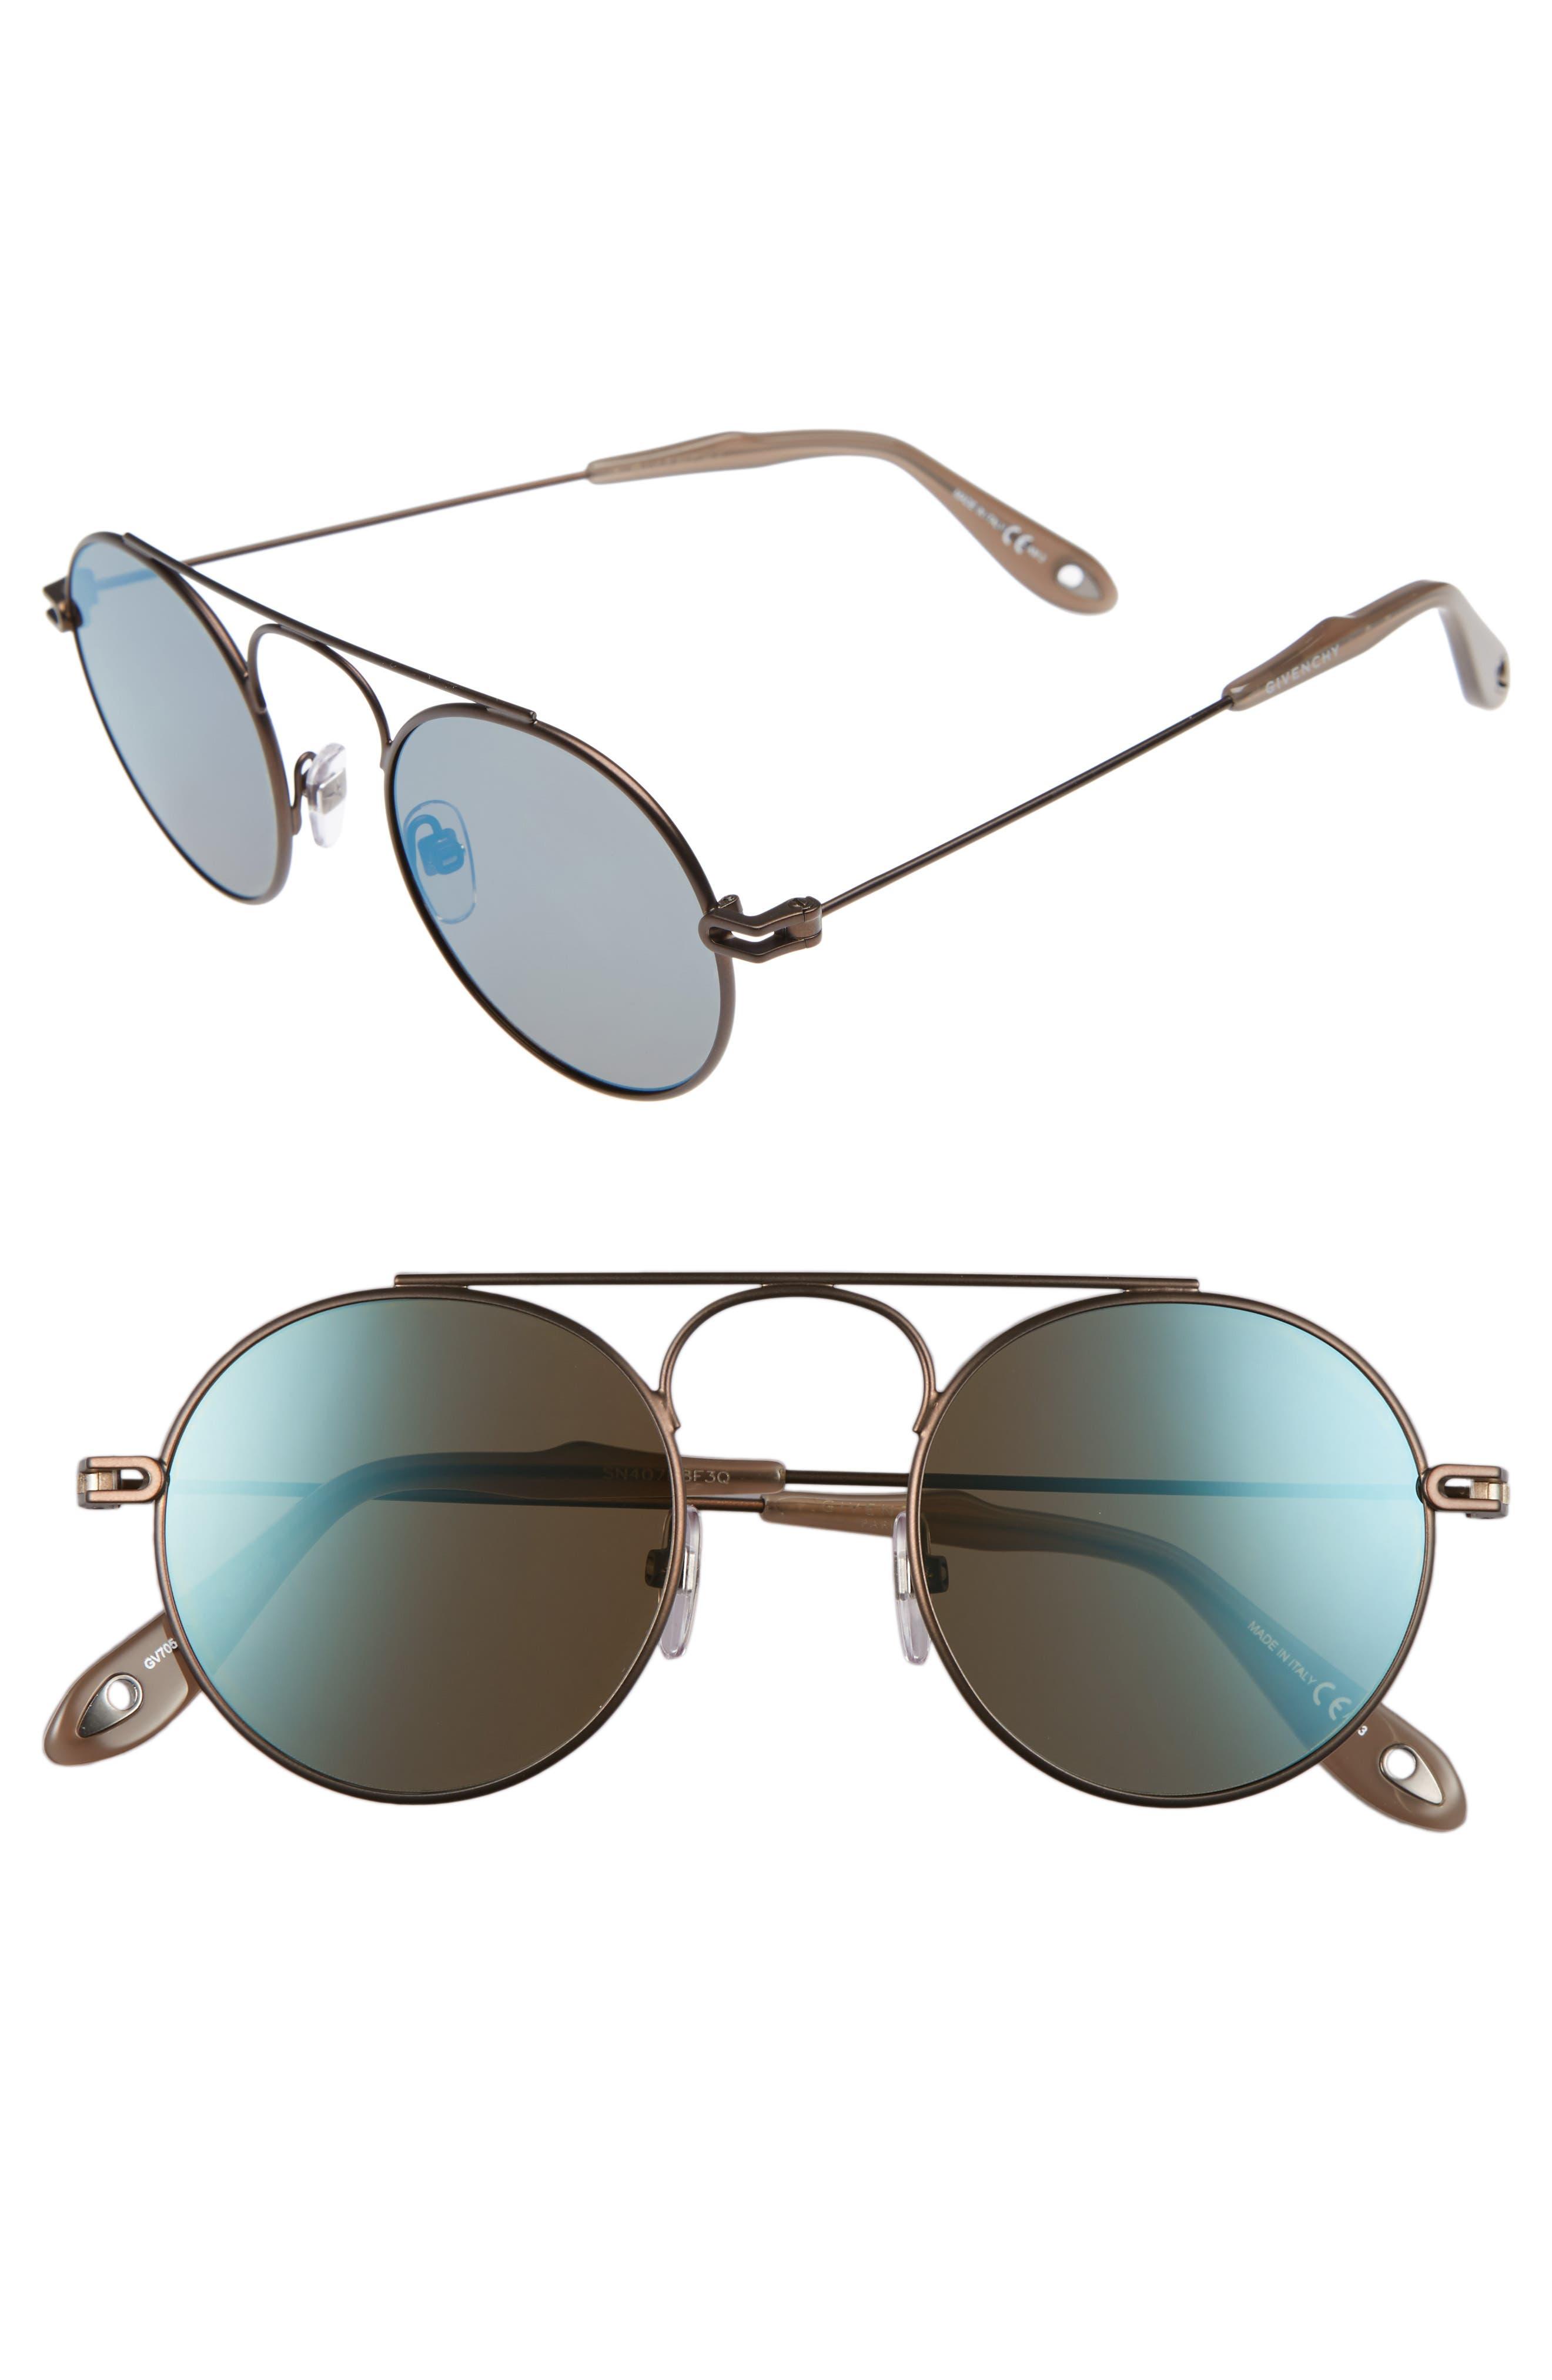 Givenchy 48mm Retro Sunglasses